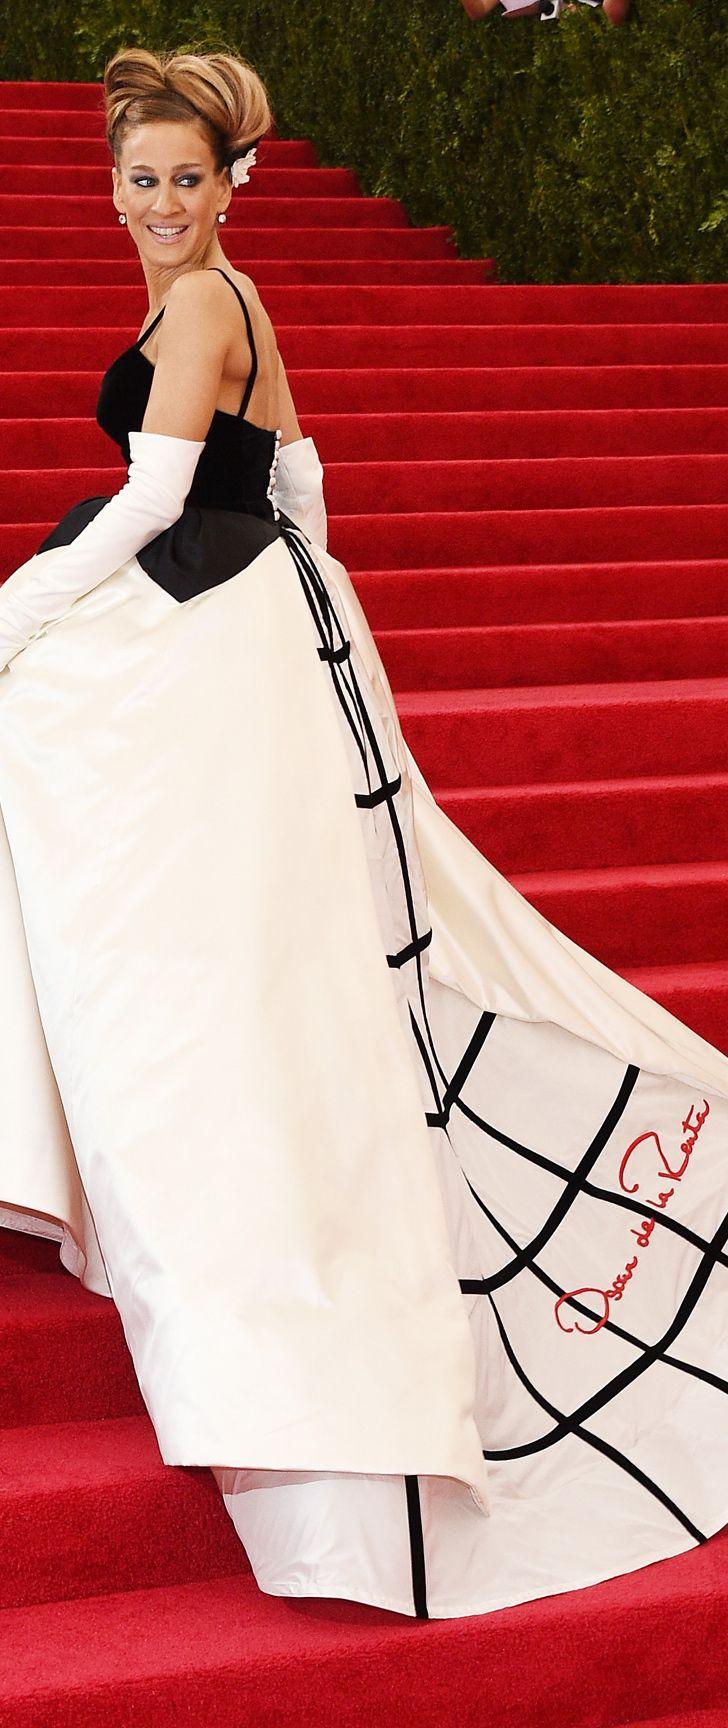 Sarah Jessica Parker in Oscar de la Renta at the 2014 Met Gala. #MetGala